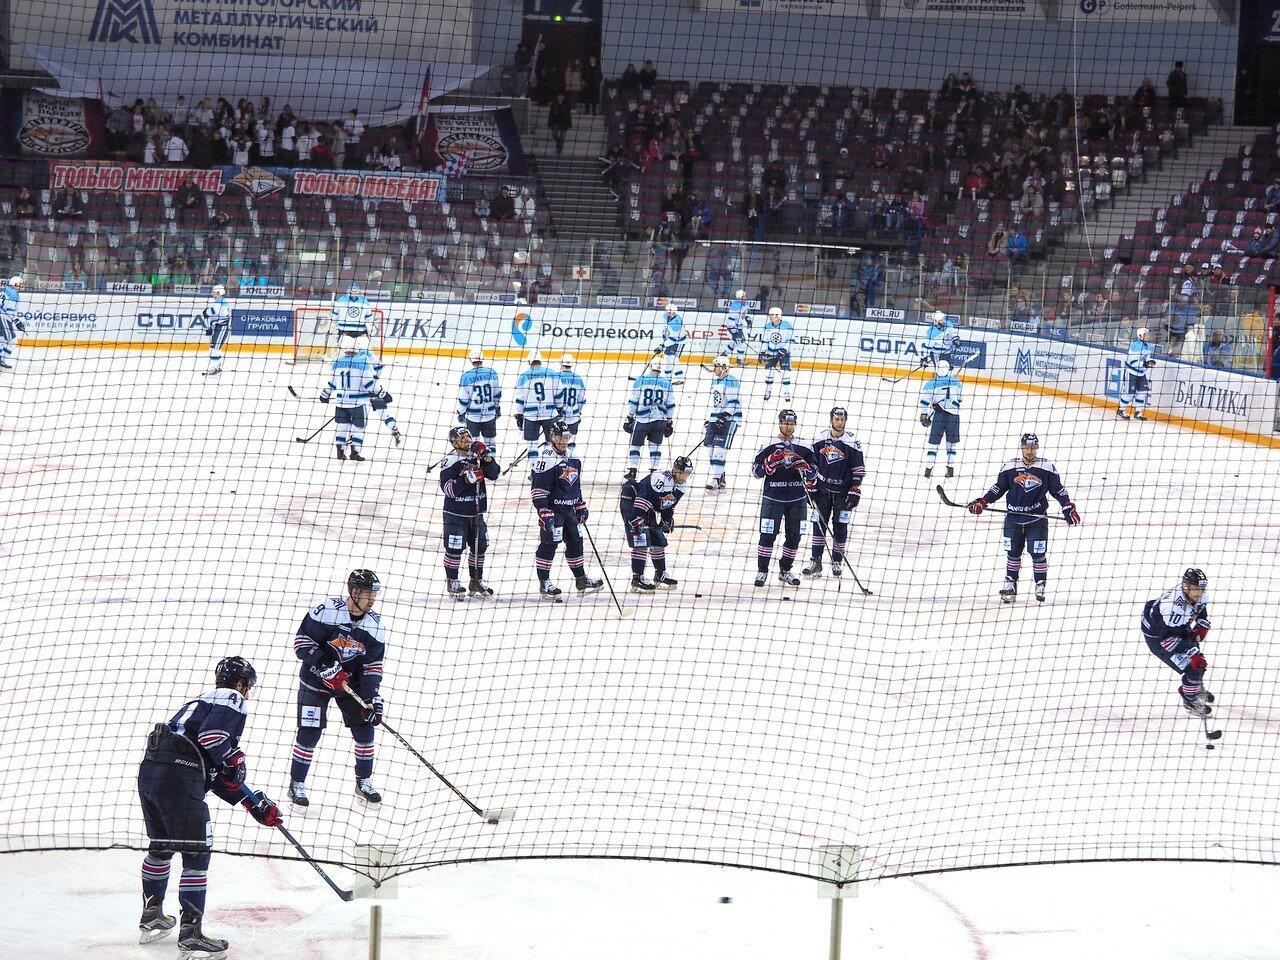 35Плей-офф 2016 Восток 1/2 Металлург - Сибирь 16.03.2016